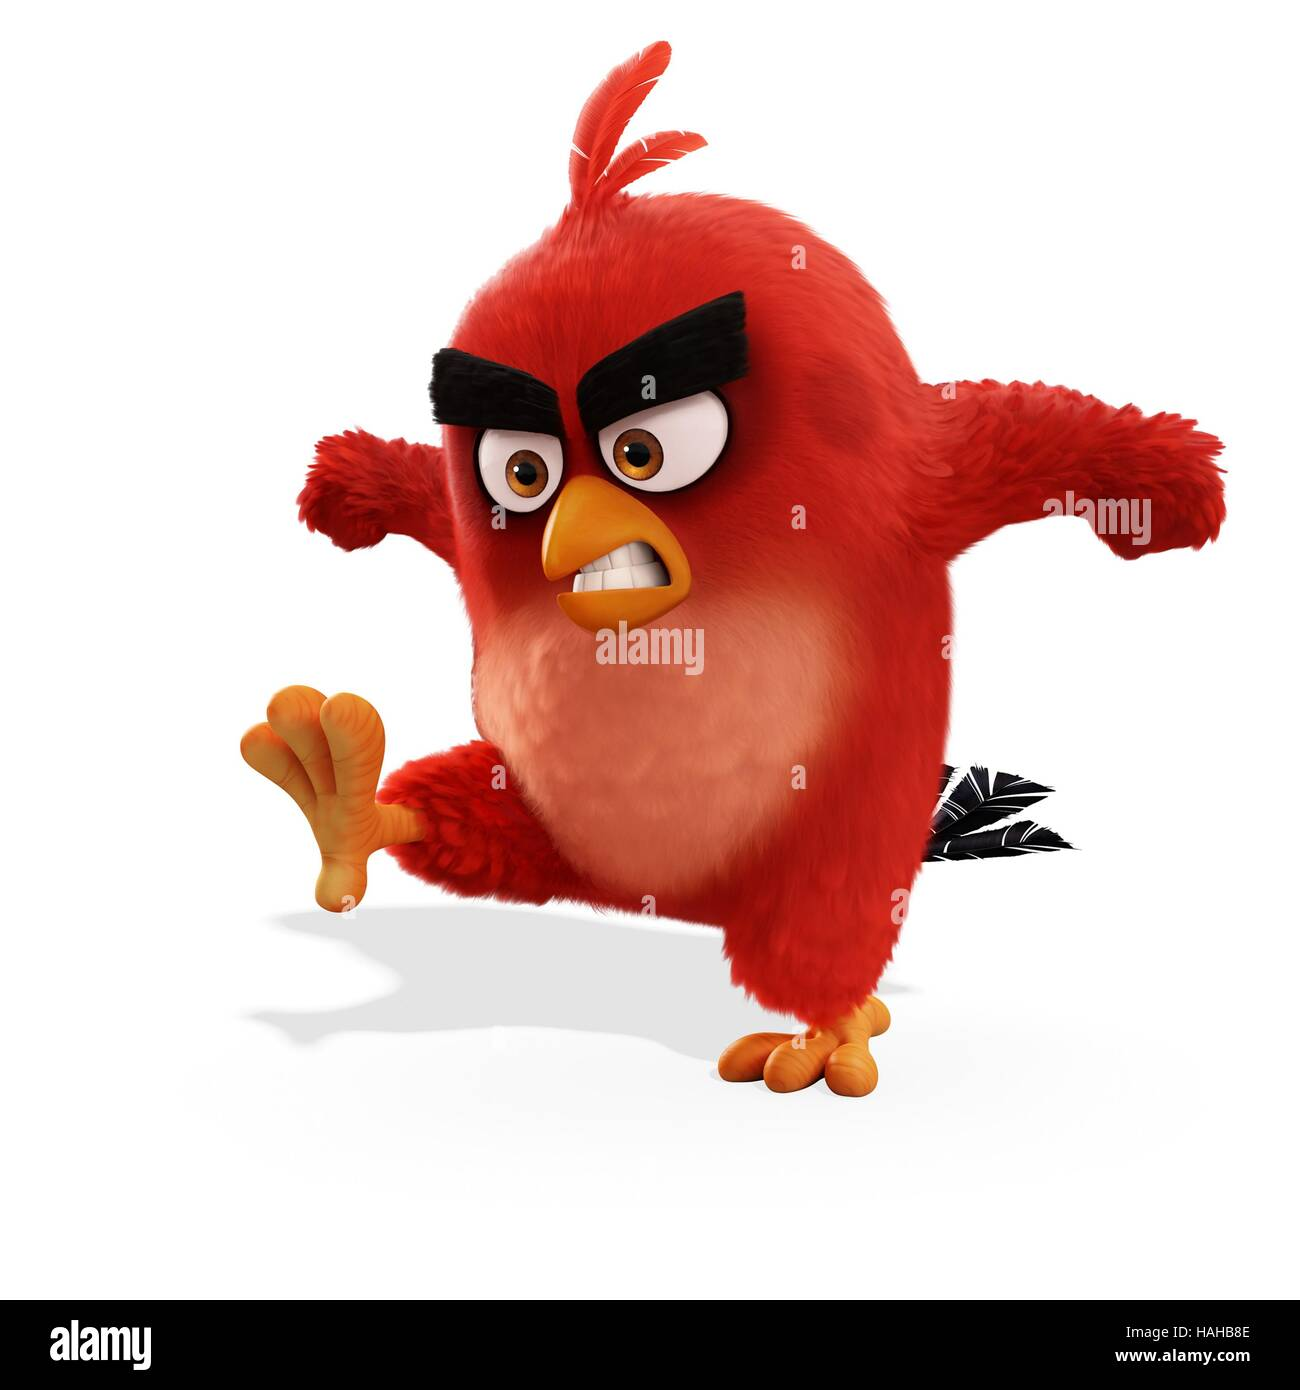 The Angry Birds Movie Year : 2016 USA Director : Clay Kaytis